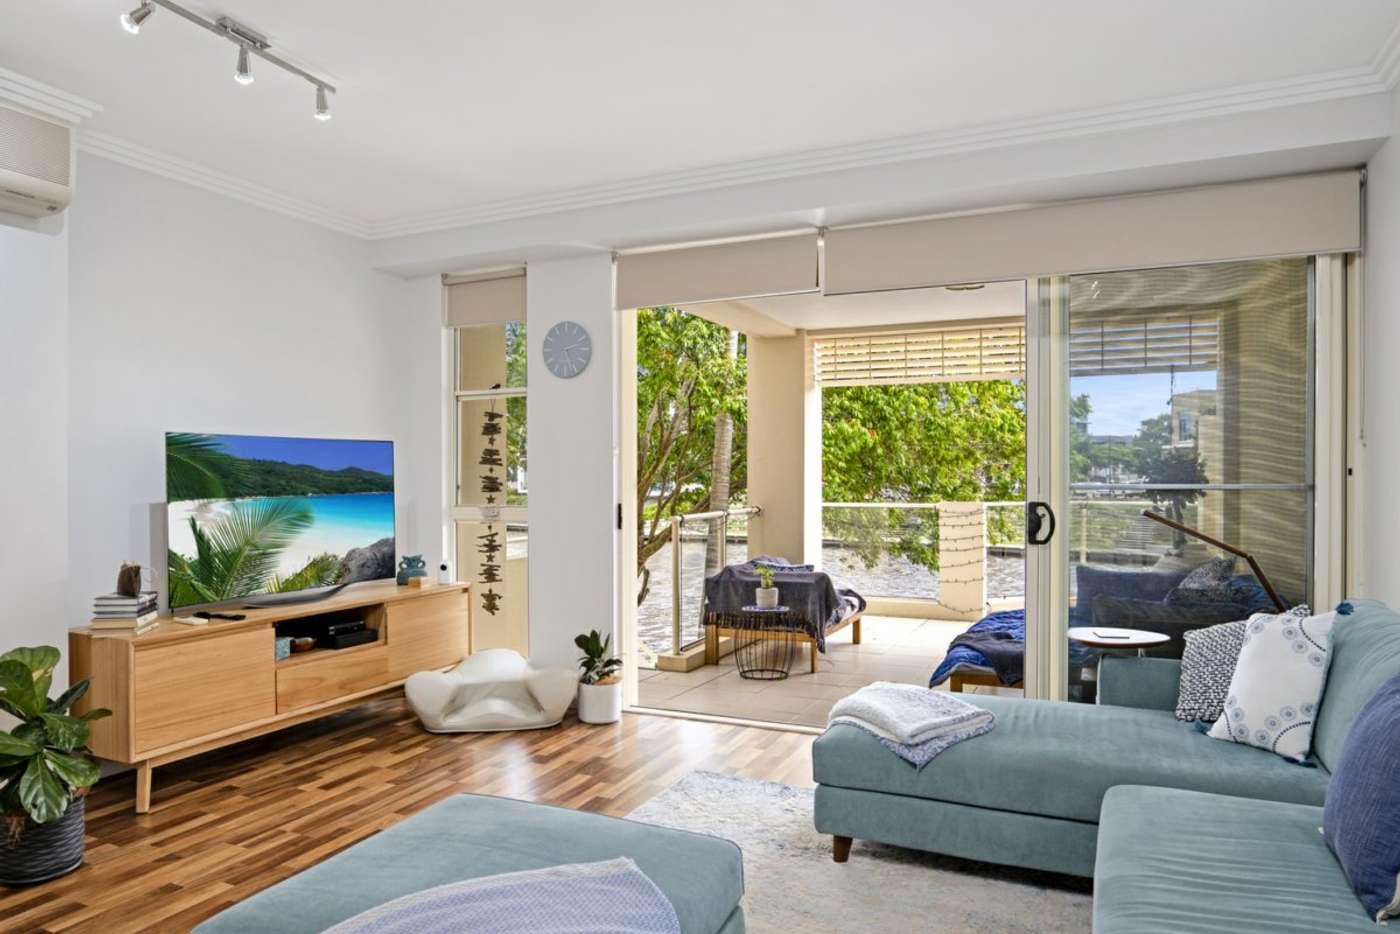 Main view of Homely apartment listing, 2/251 Varsity Parade, Varsity Lakes QLD 4227